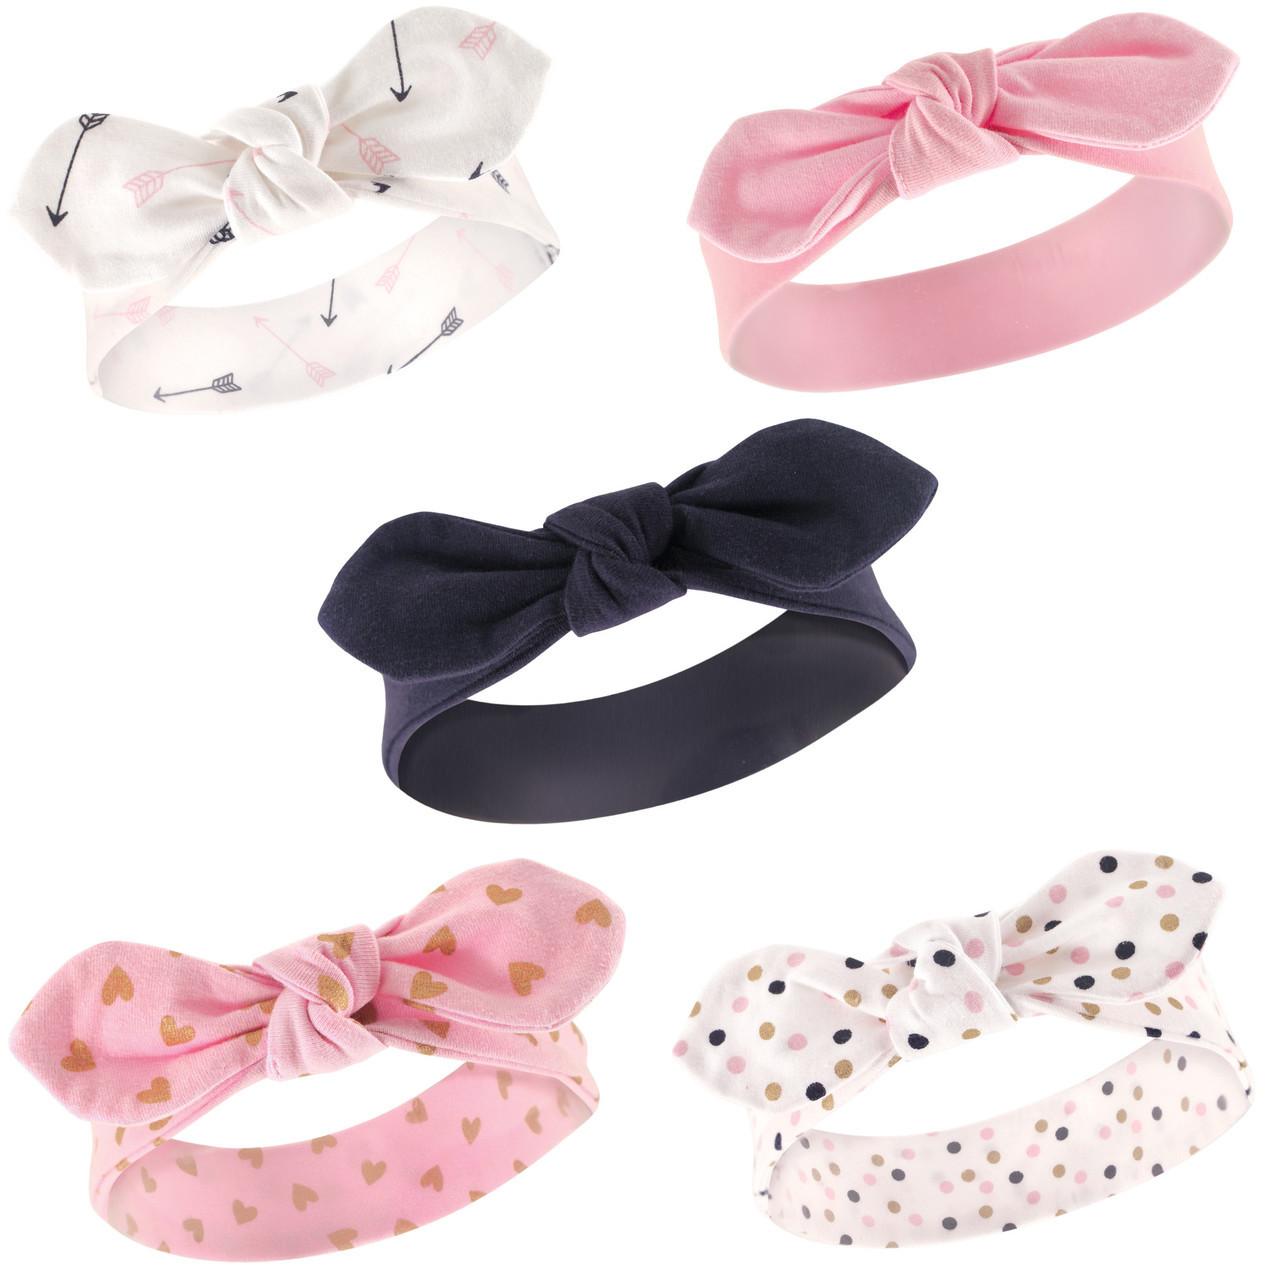 Baby Girl Dress Headband Pink with White Hearts